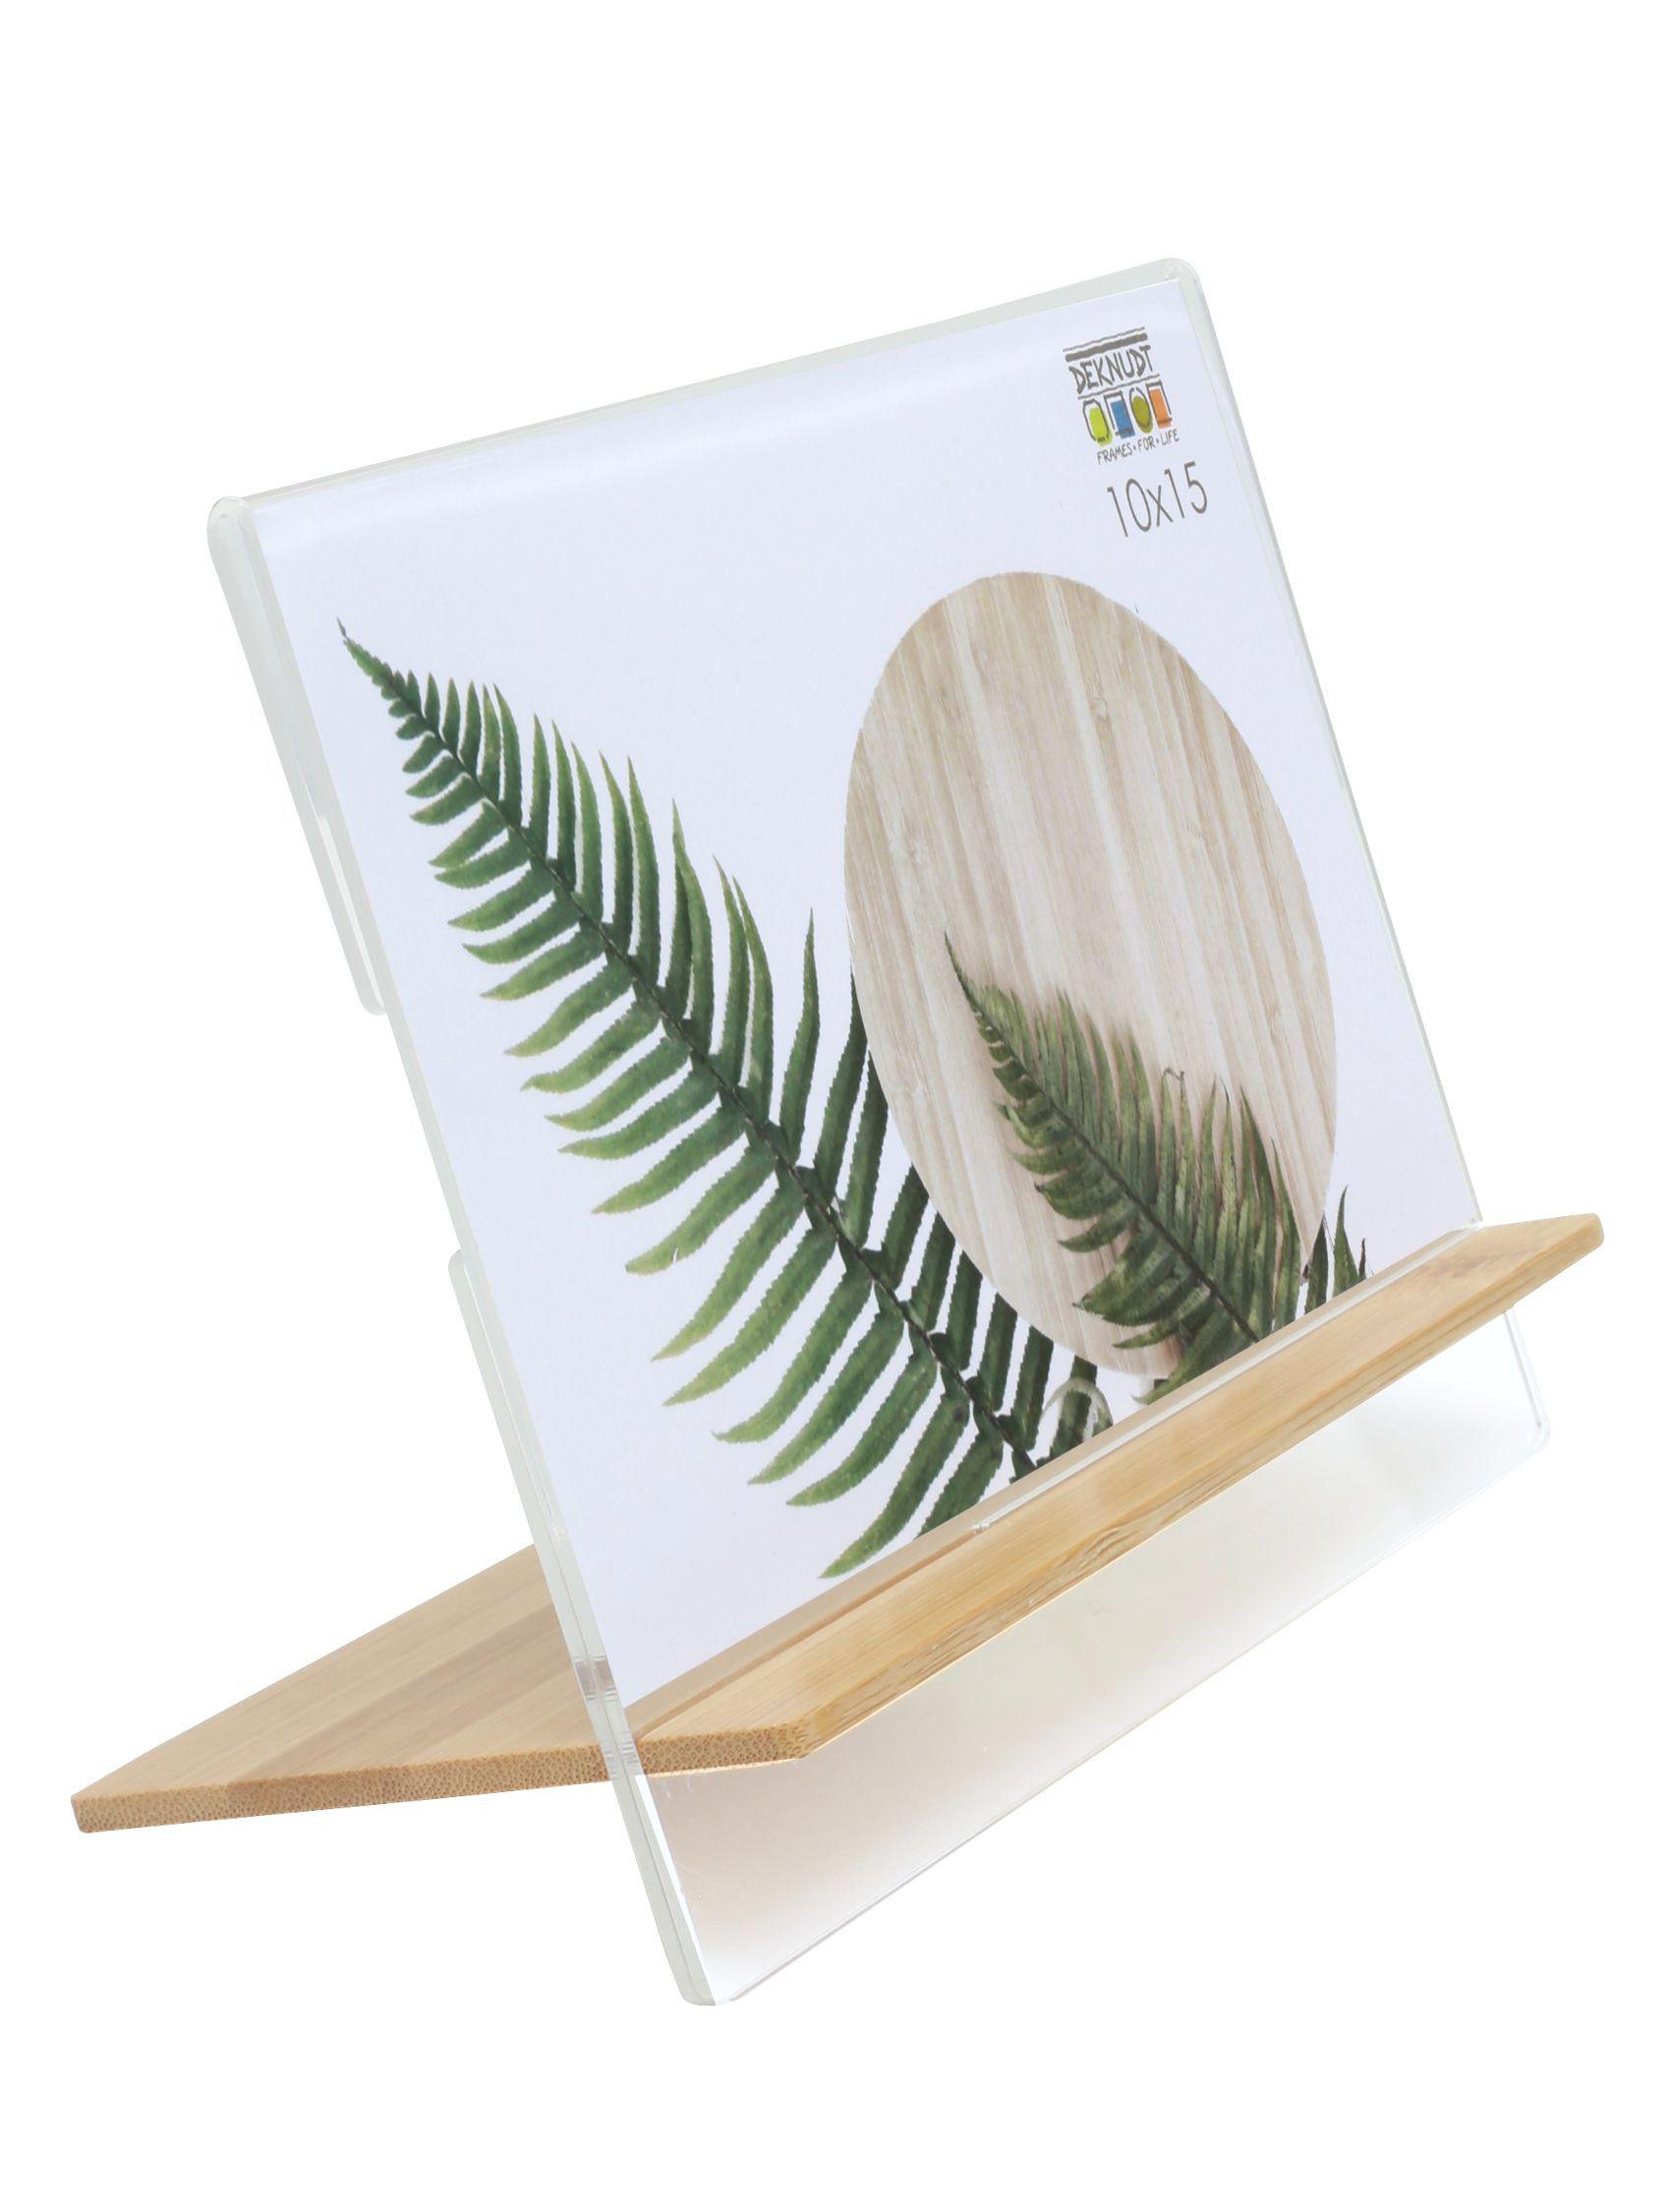 Transparante fotokader in plexi met staander in naturel hout S58RX1